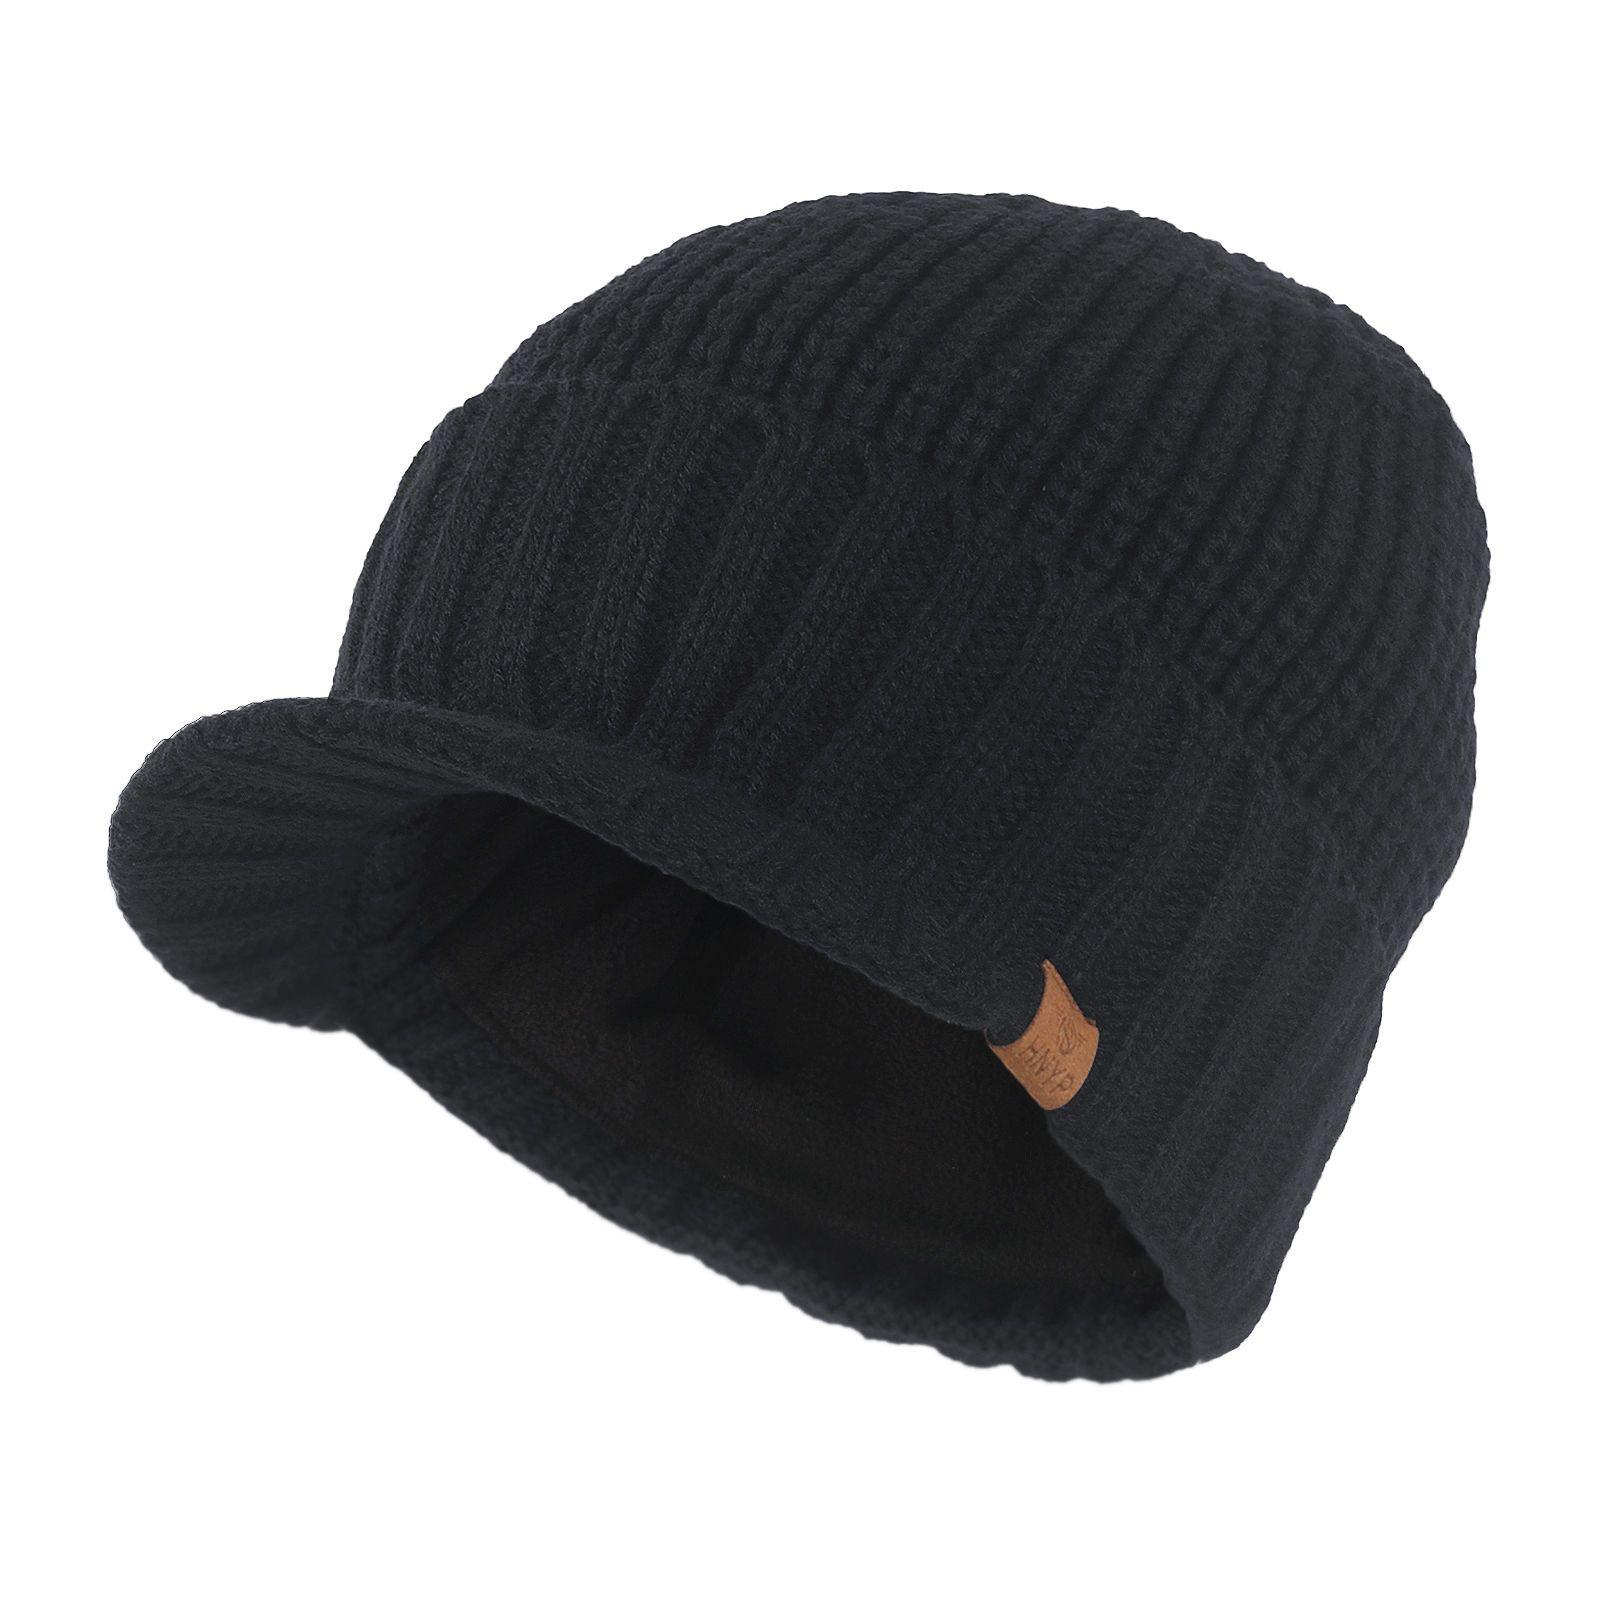 51795001af4 Mens Winter Stylish Black Visor Brim Beanie Brimmer Billed Hat Knit  Baseball Cap Snapback Hats Cowboy Hats From Fashionf